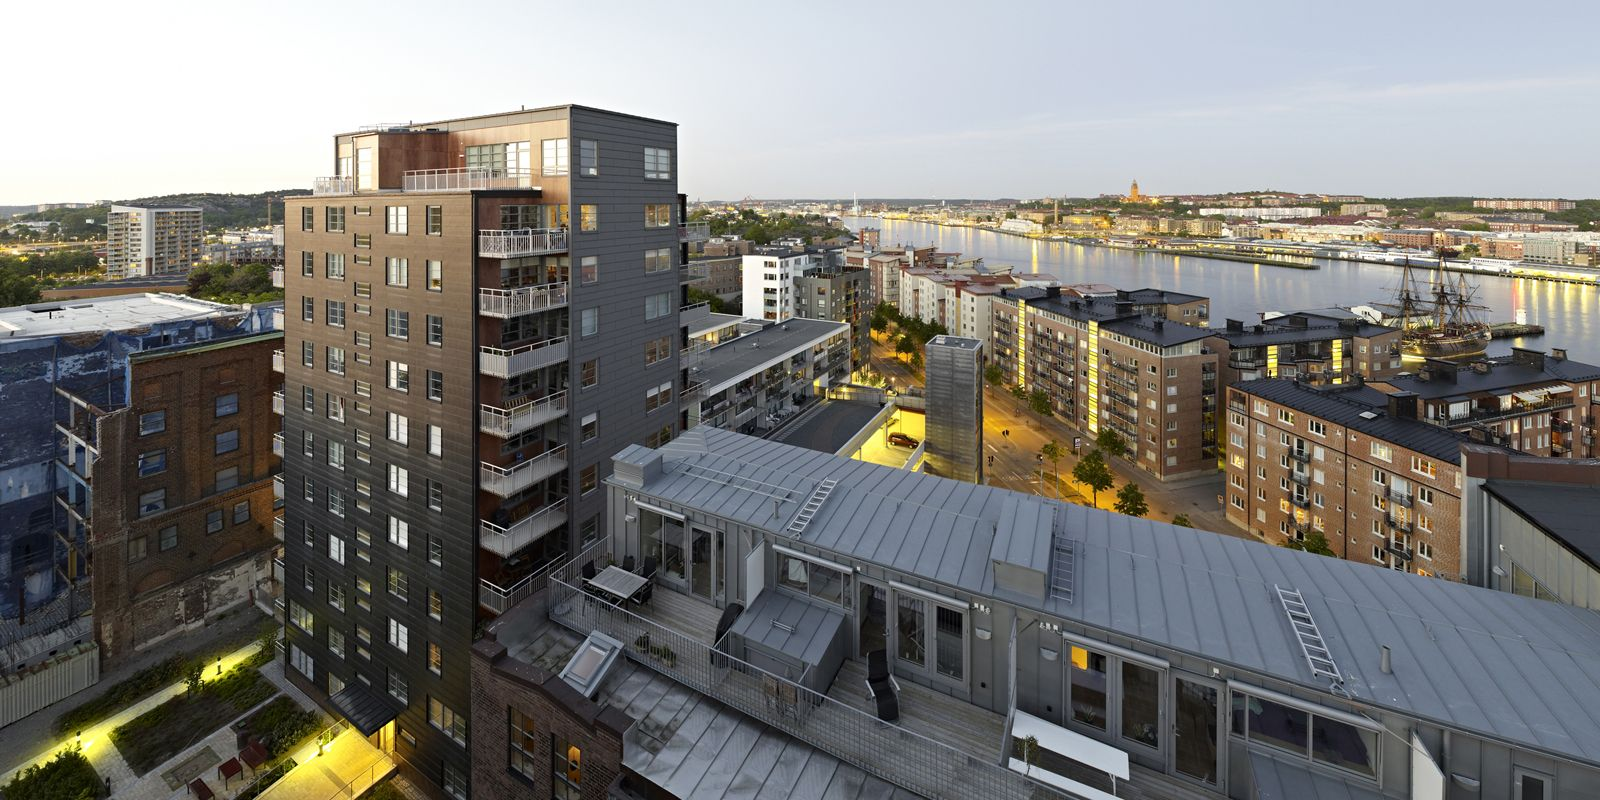 Eriksberg Hofors karta - patient-survey.net